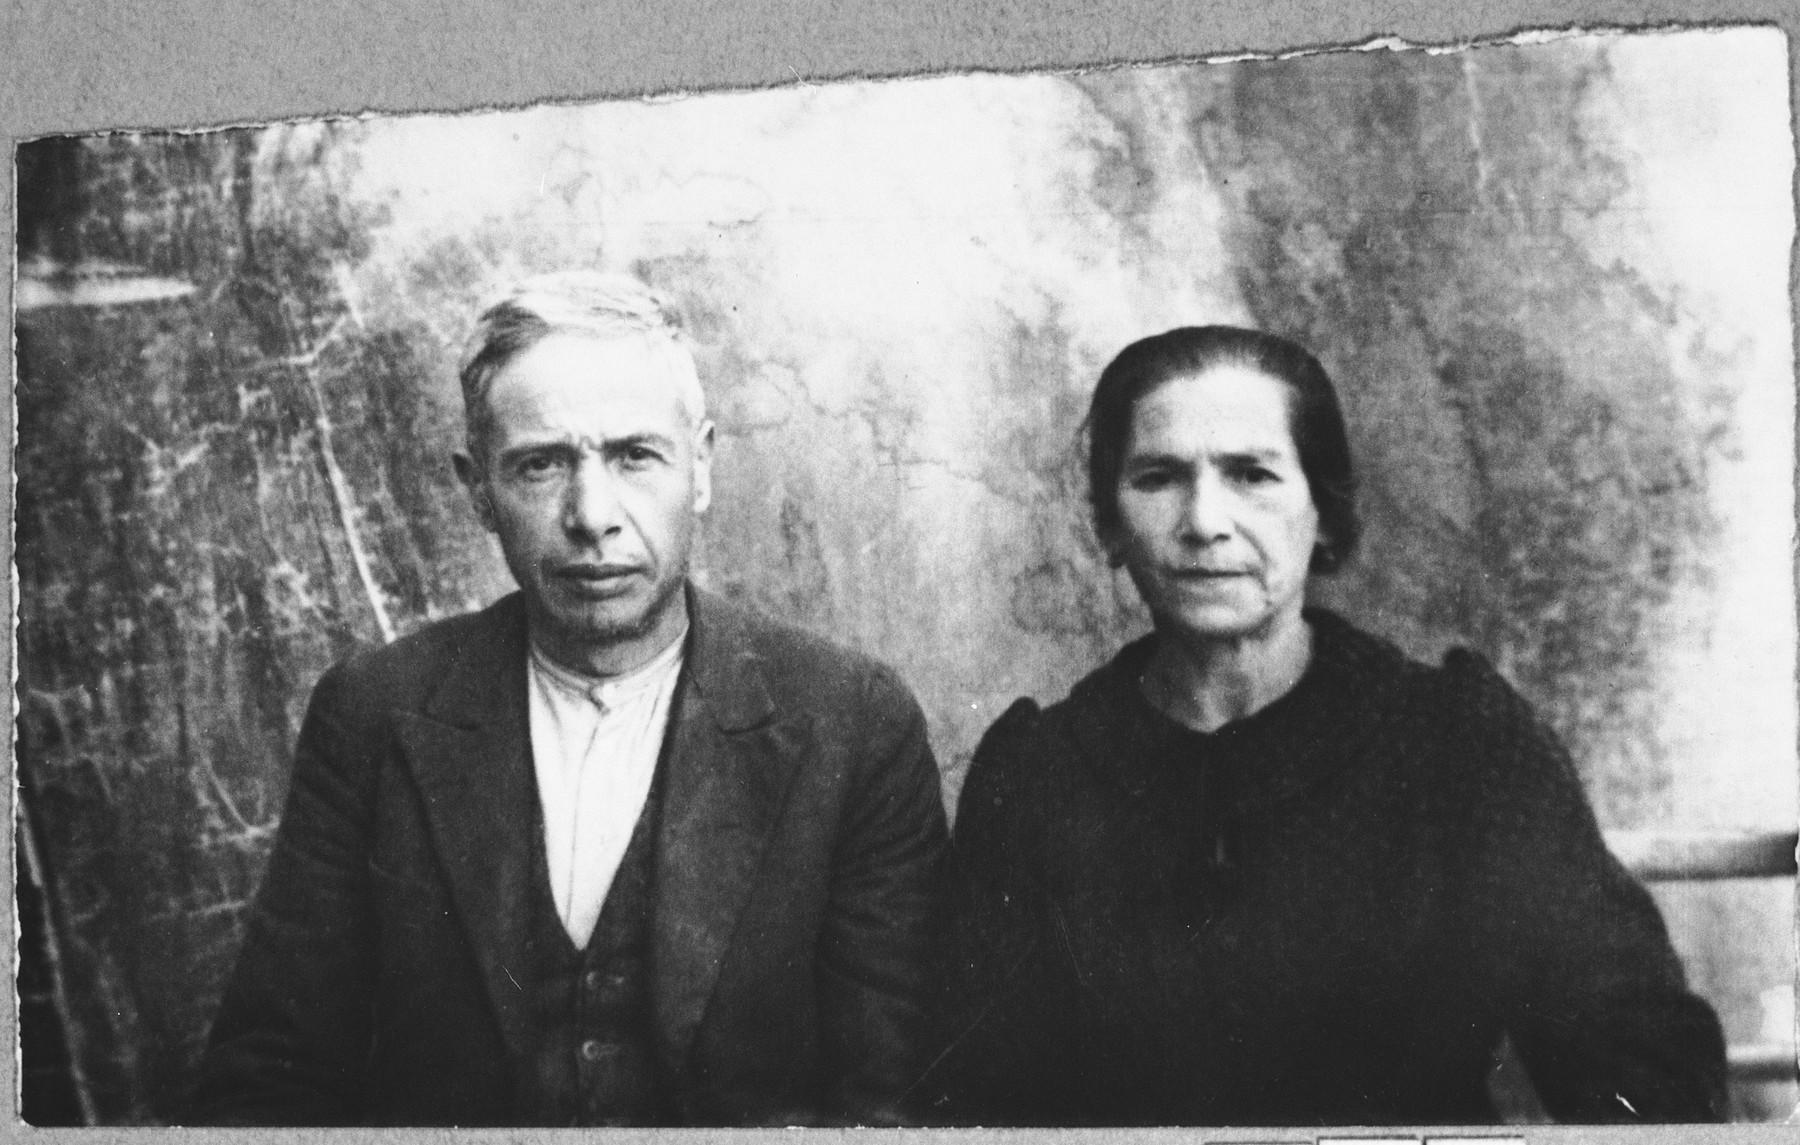 Portrait of Mushon Kassorla, son of David Kassorla, and his wife, Miriam.  Mushon was a merchant.  They lived at Novatska 11A in Bitola.